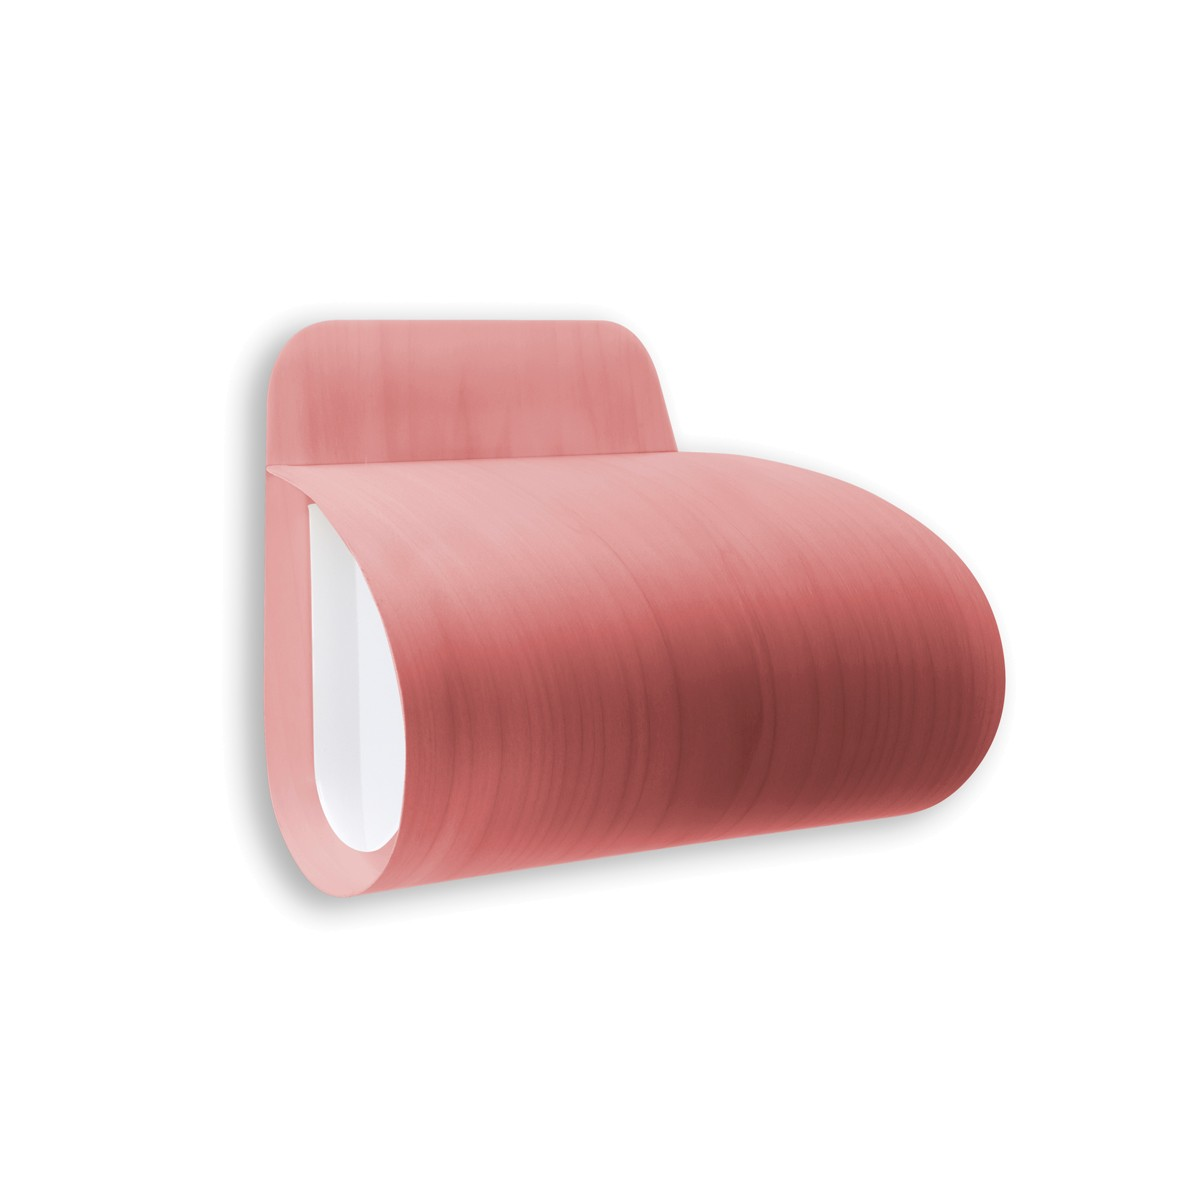 LZF Lamps Pleg LED Wandleuchte, pink